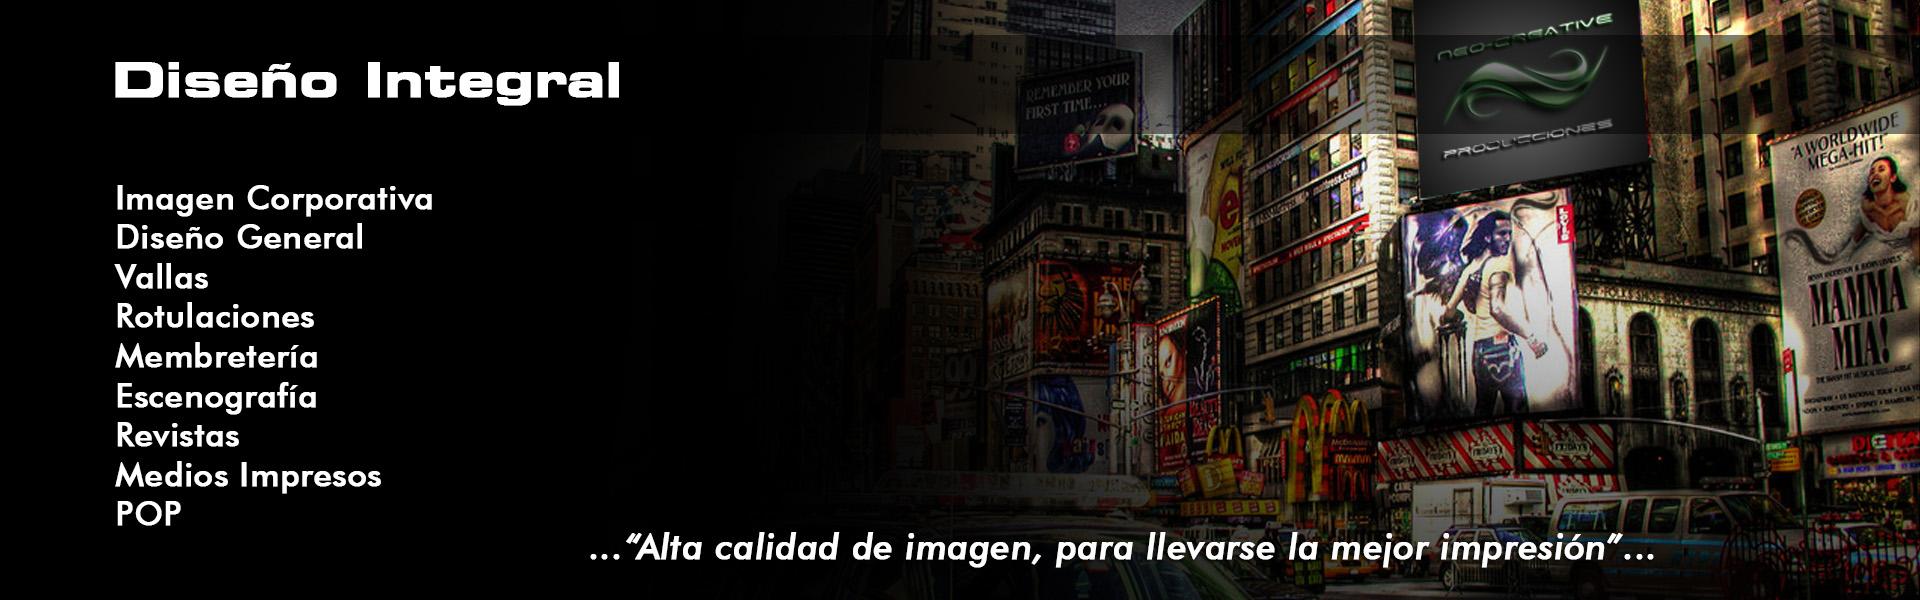 http://www.neo-creative.net/5.0/wp-content/uploads/2014/02/Slides_Diseño.jpg